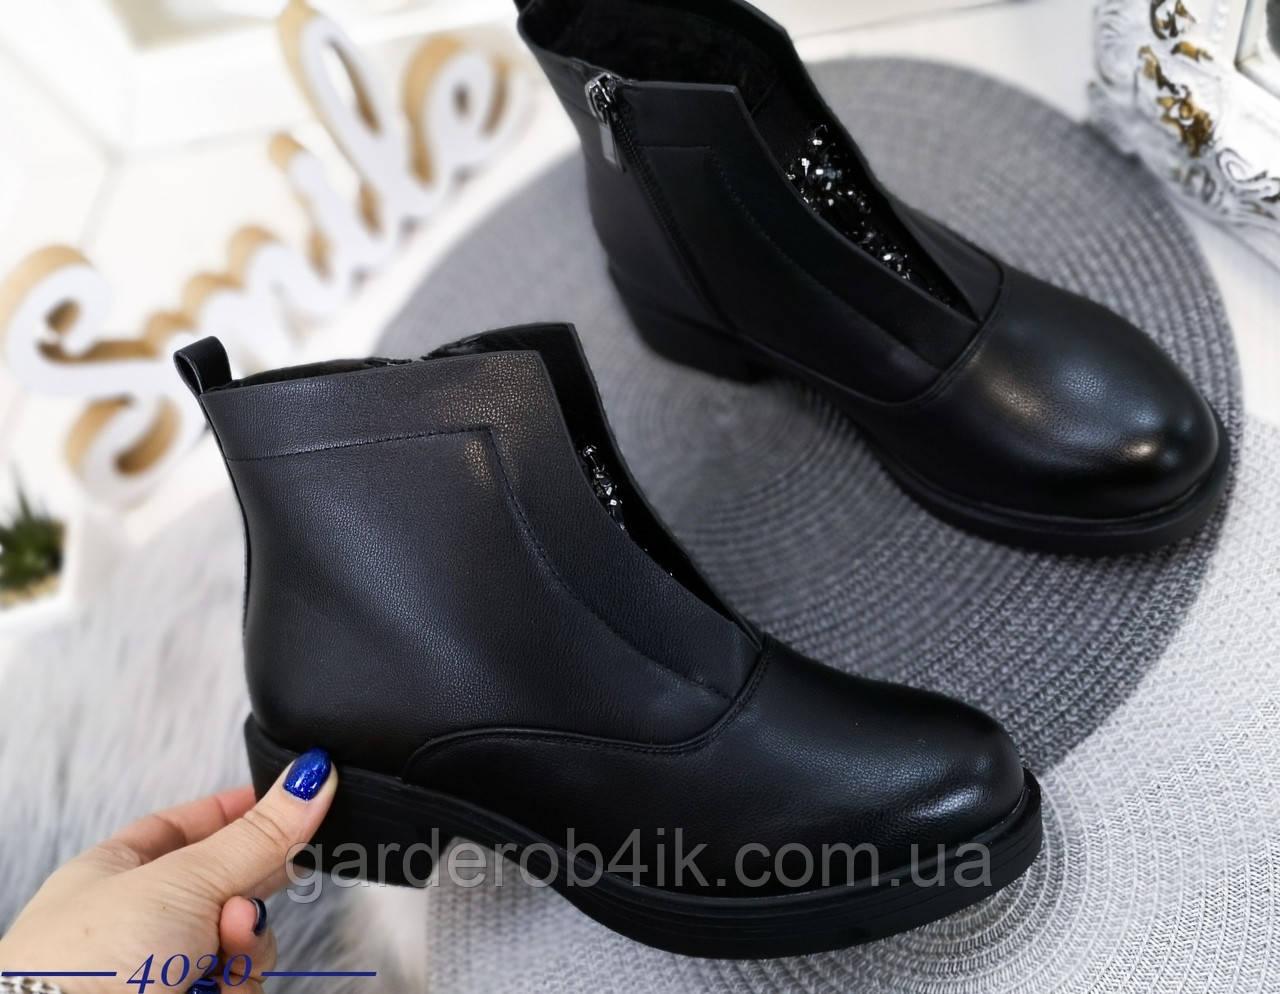 Женские ботинки сезон зима